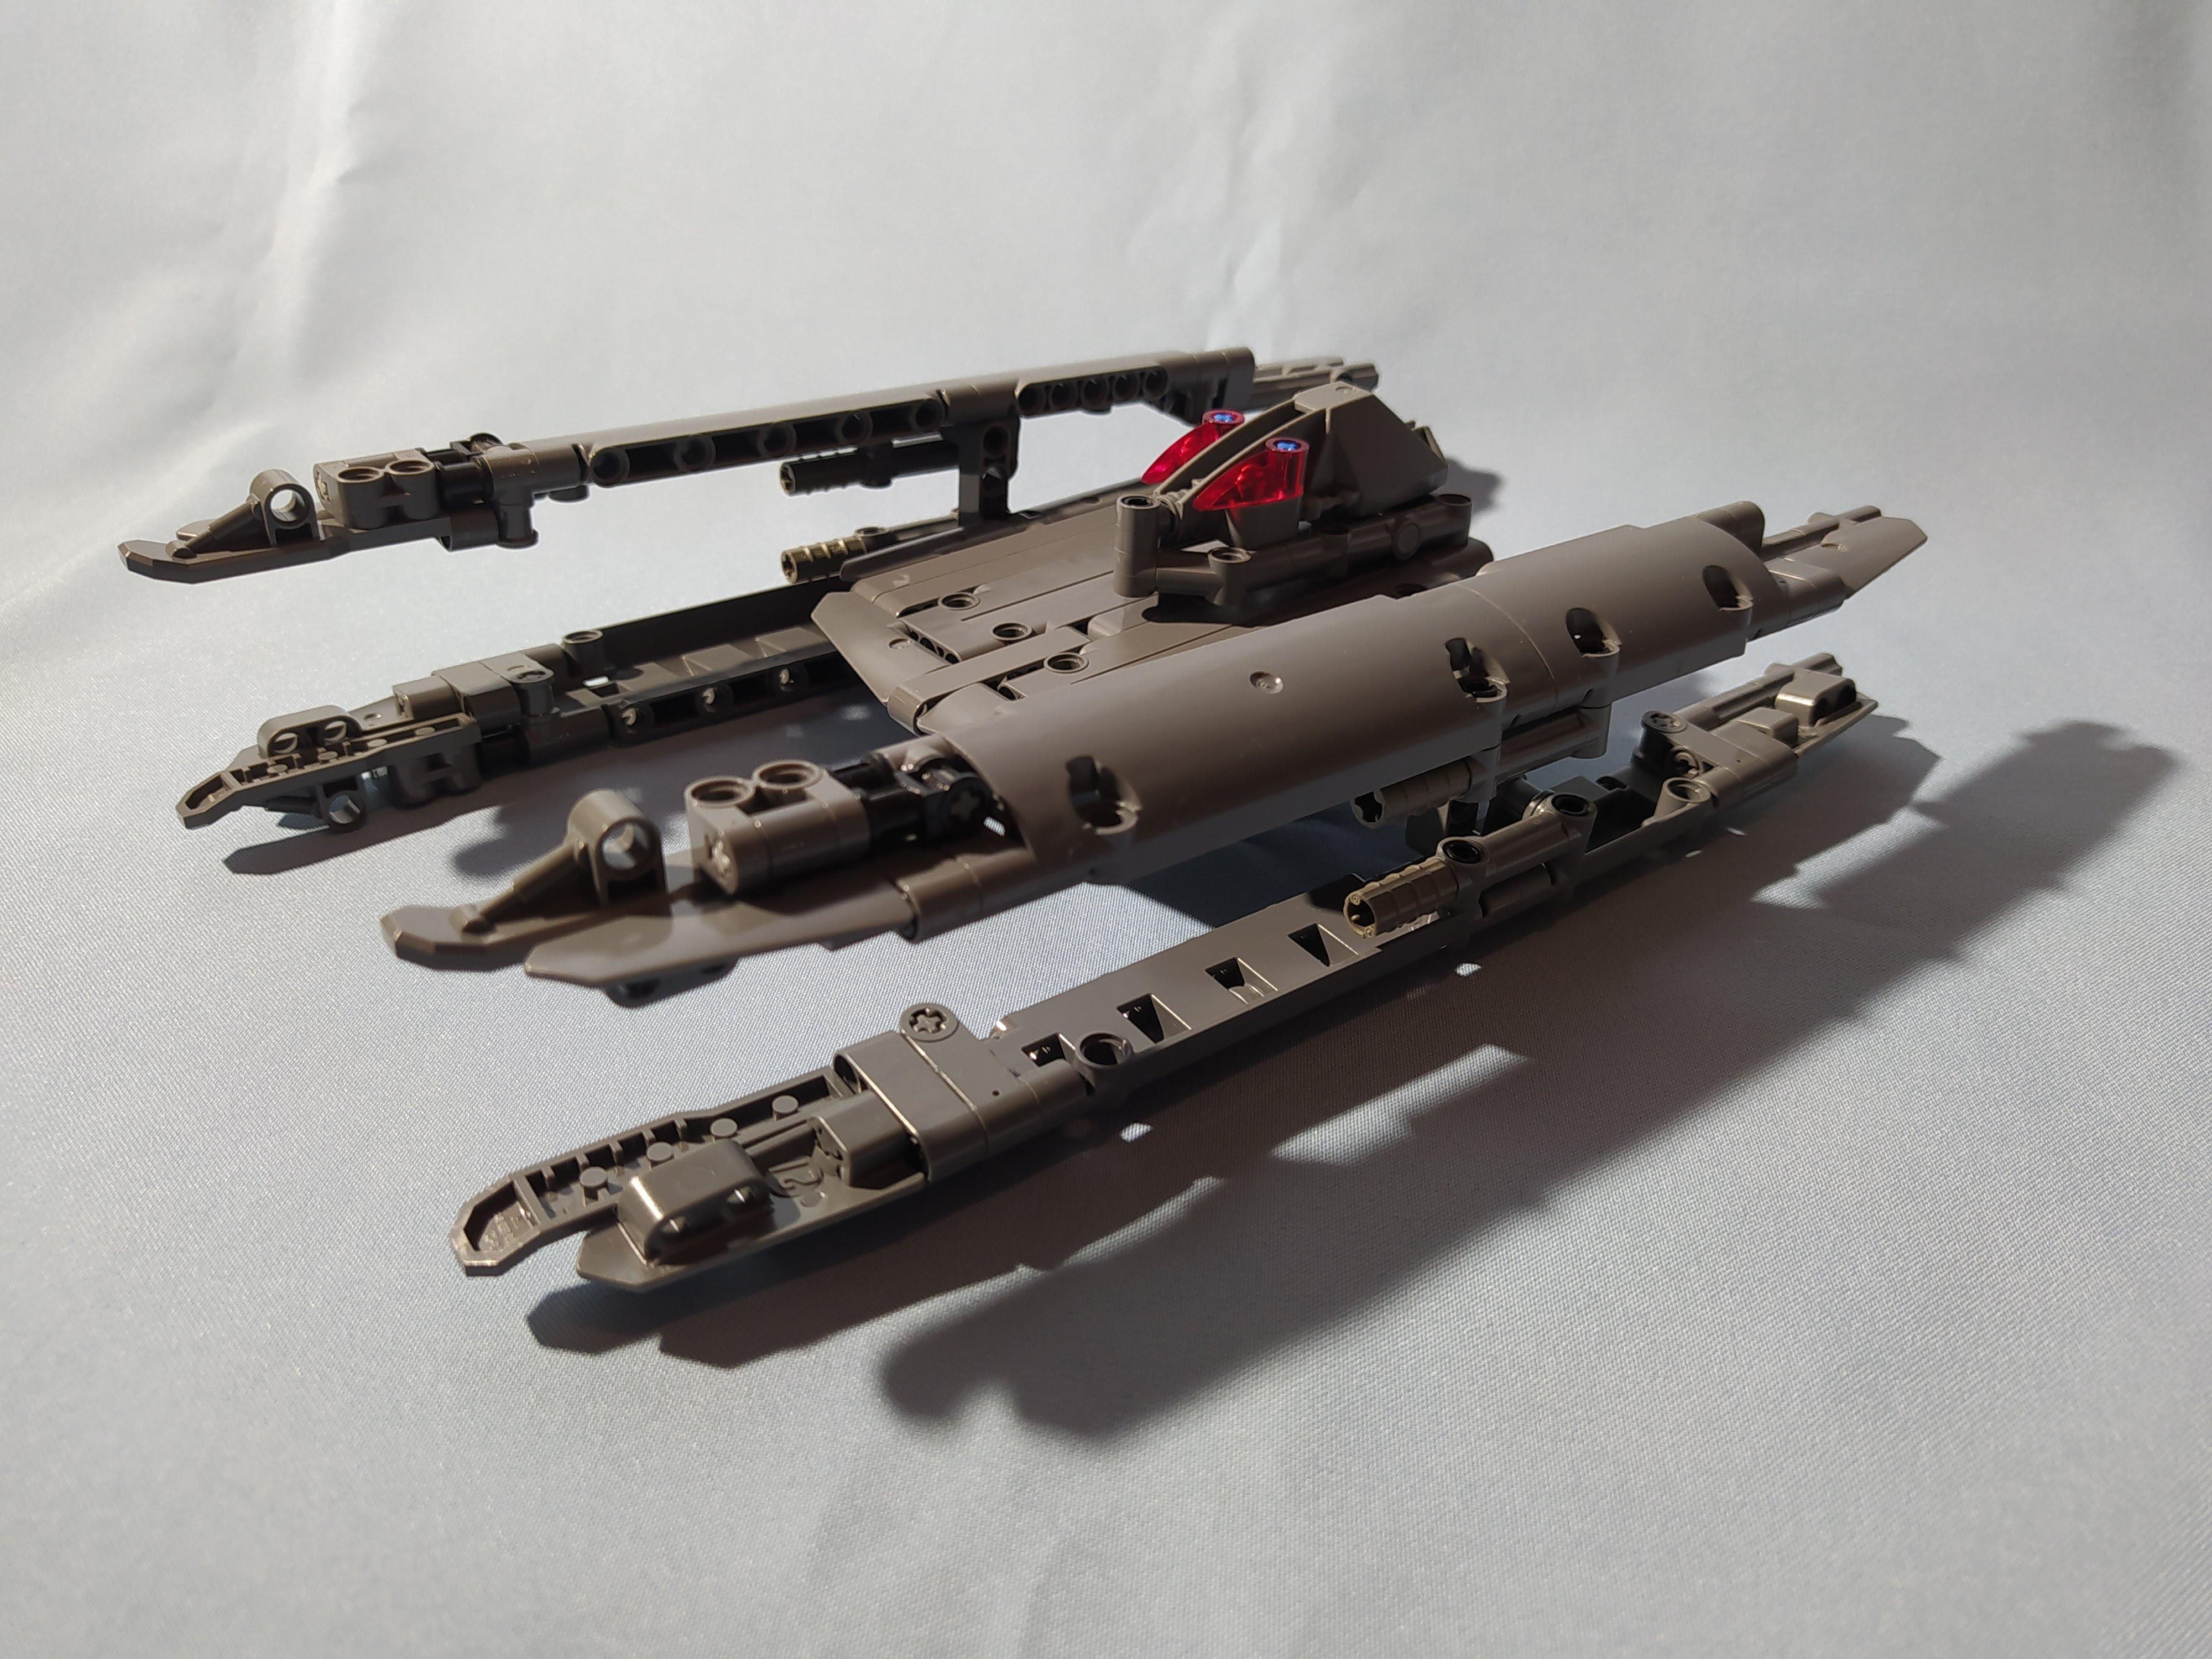 Concurs Tot ce zboara si nu se mananca – Creatia 2: Separatist Vulture Droid